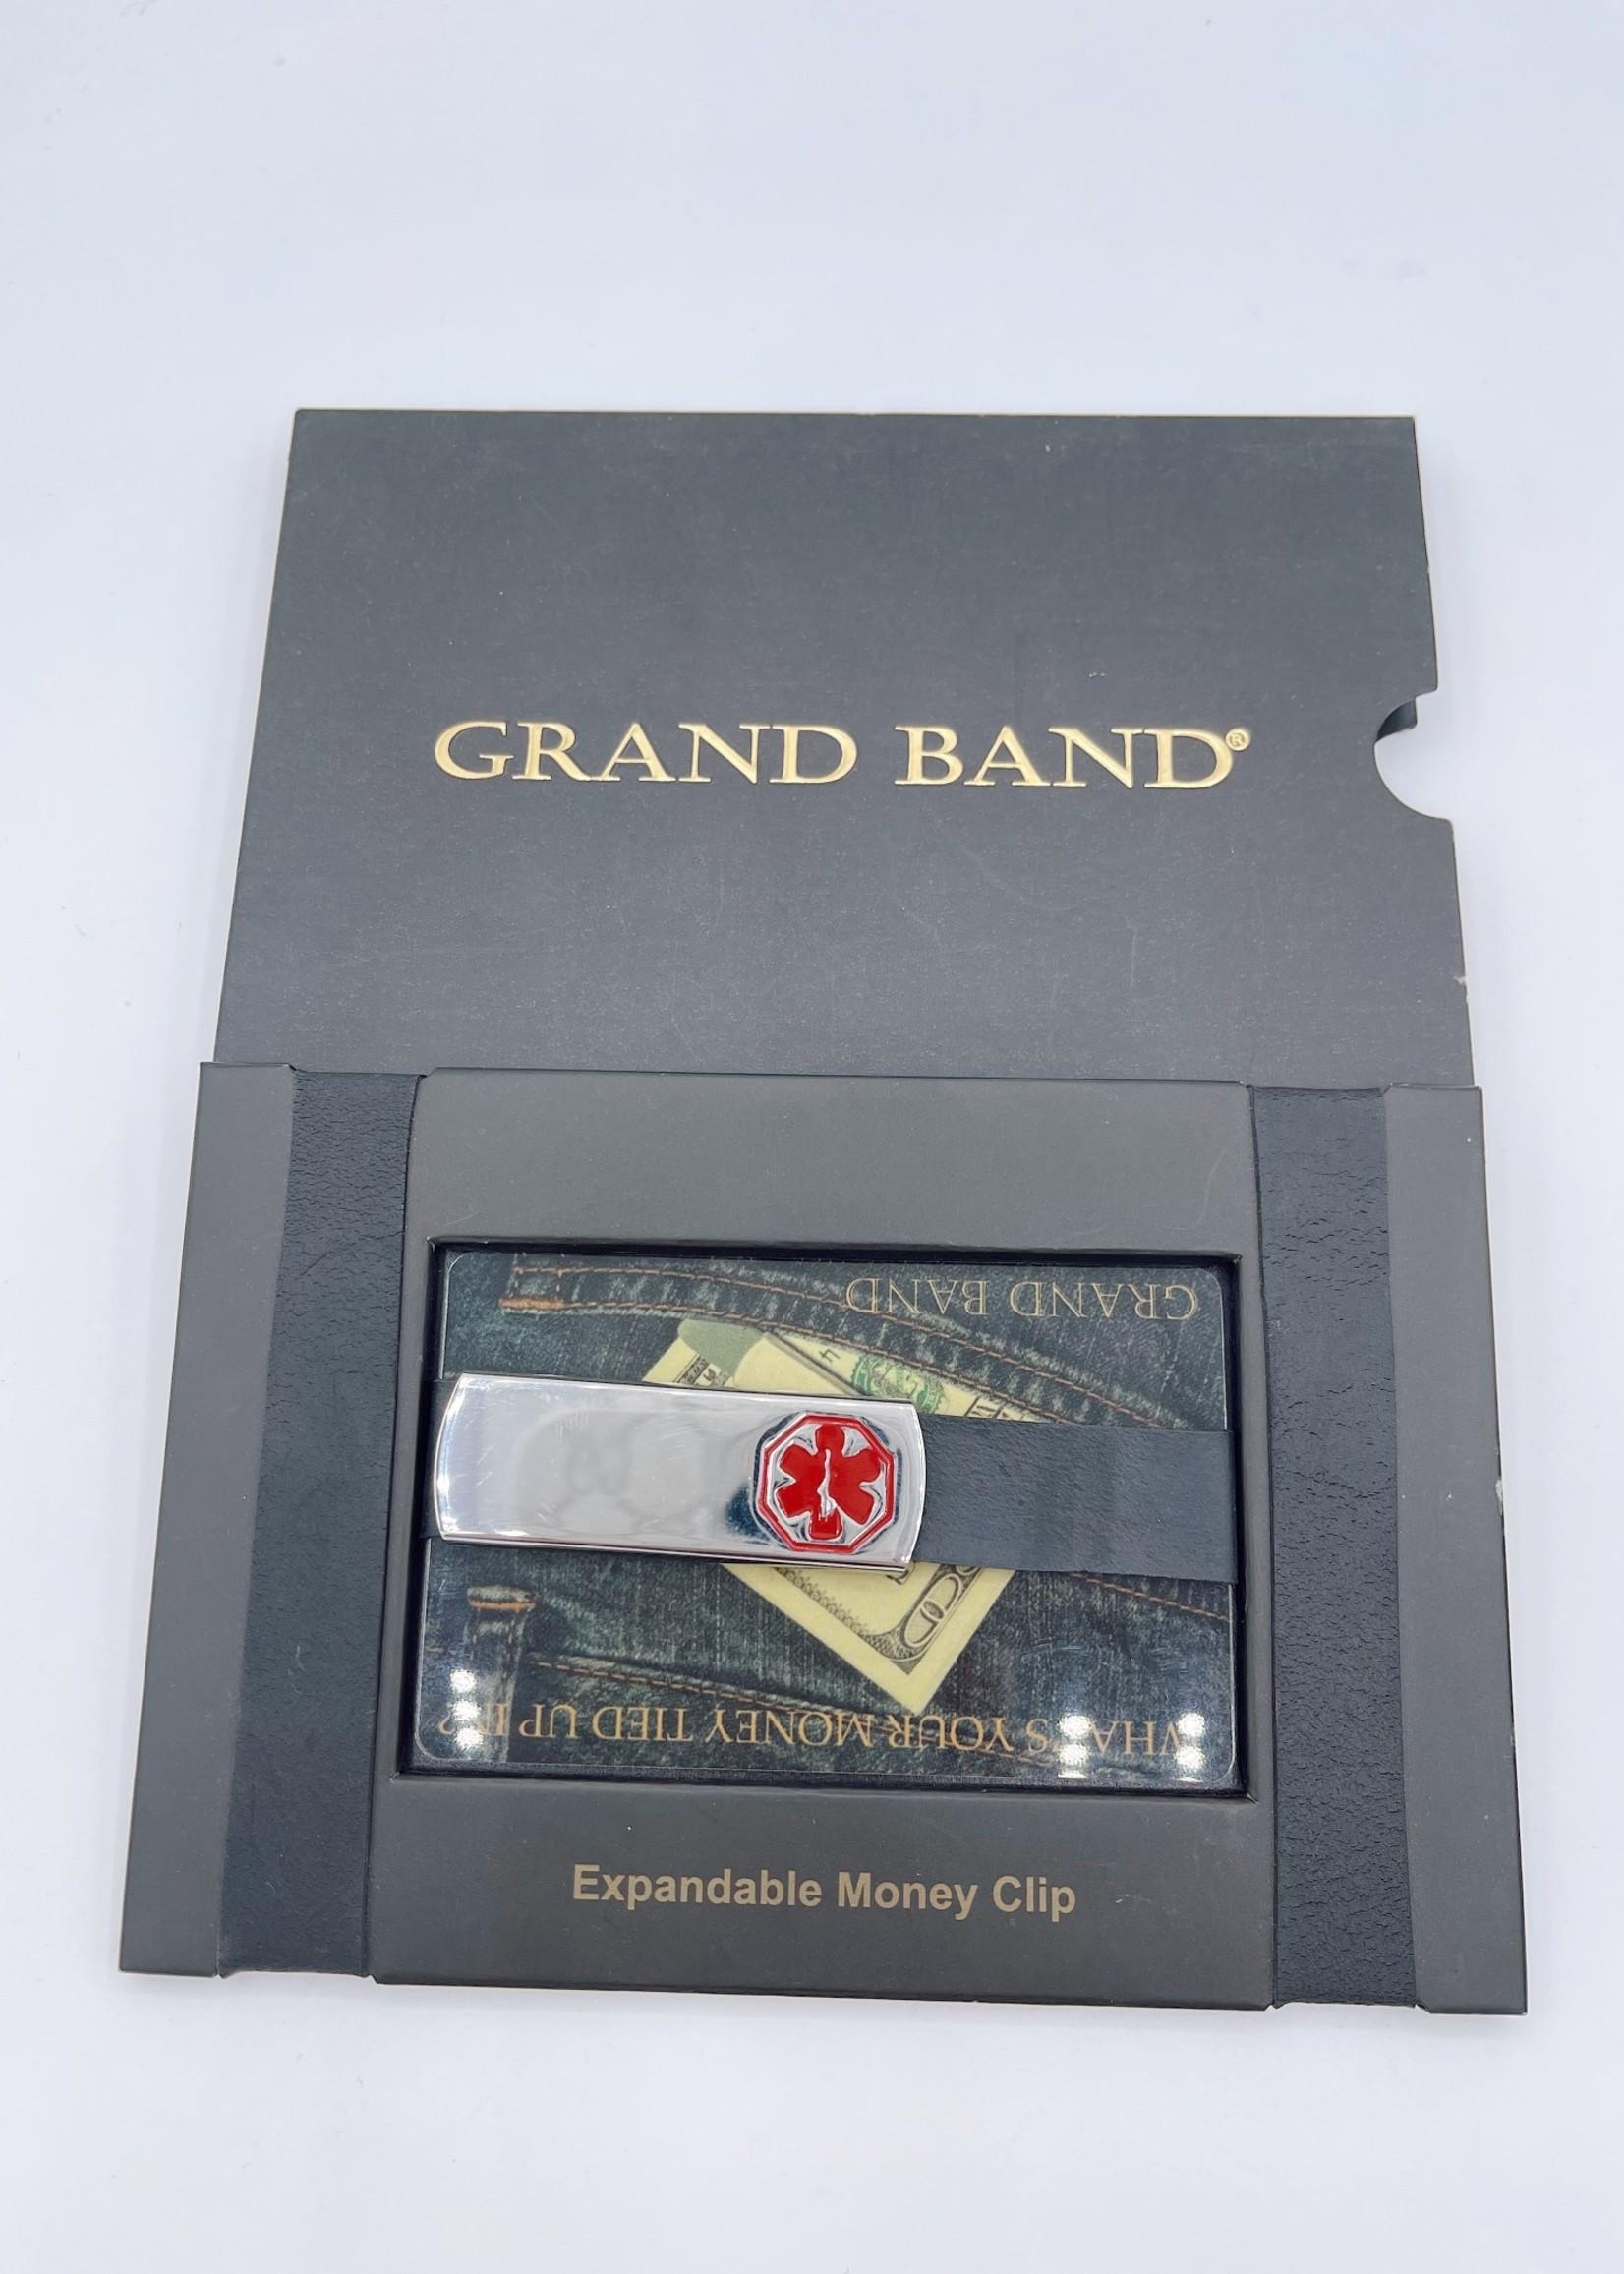 Grand Band Expandable Money Clip